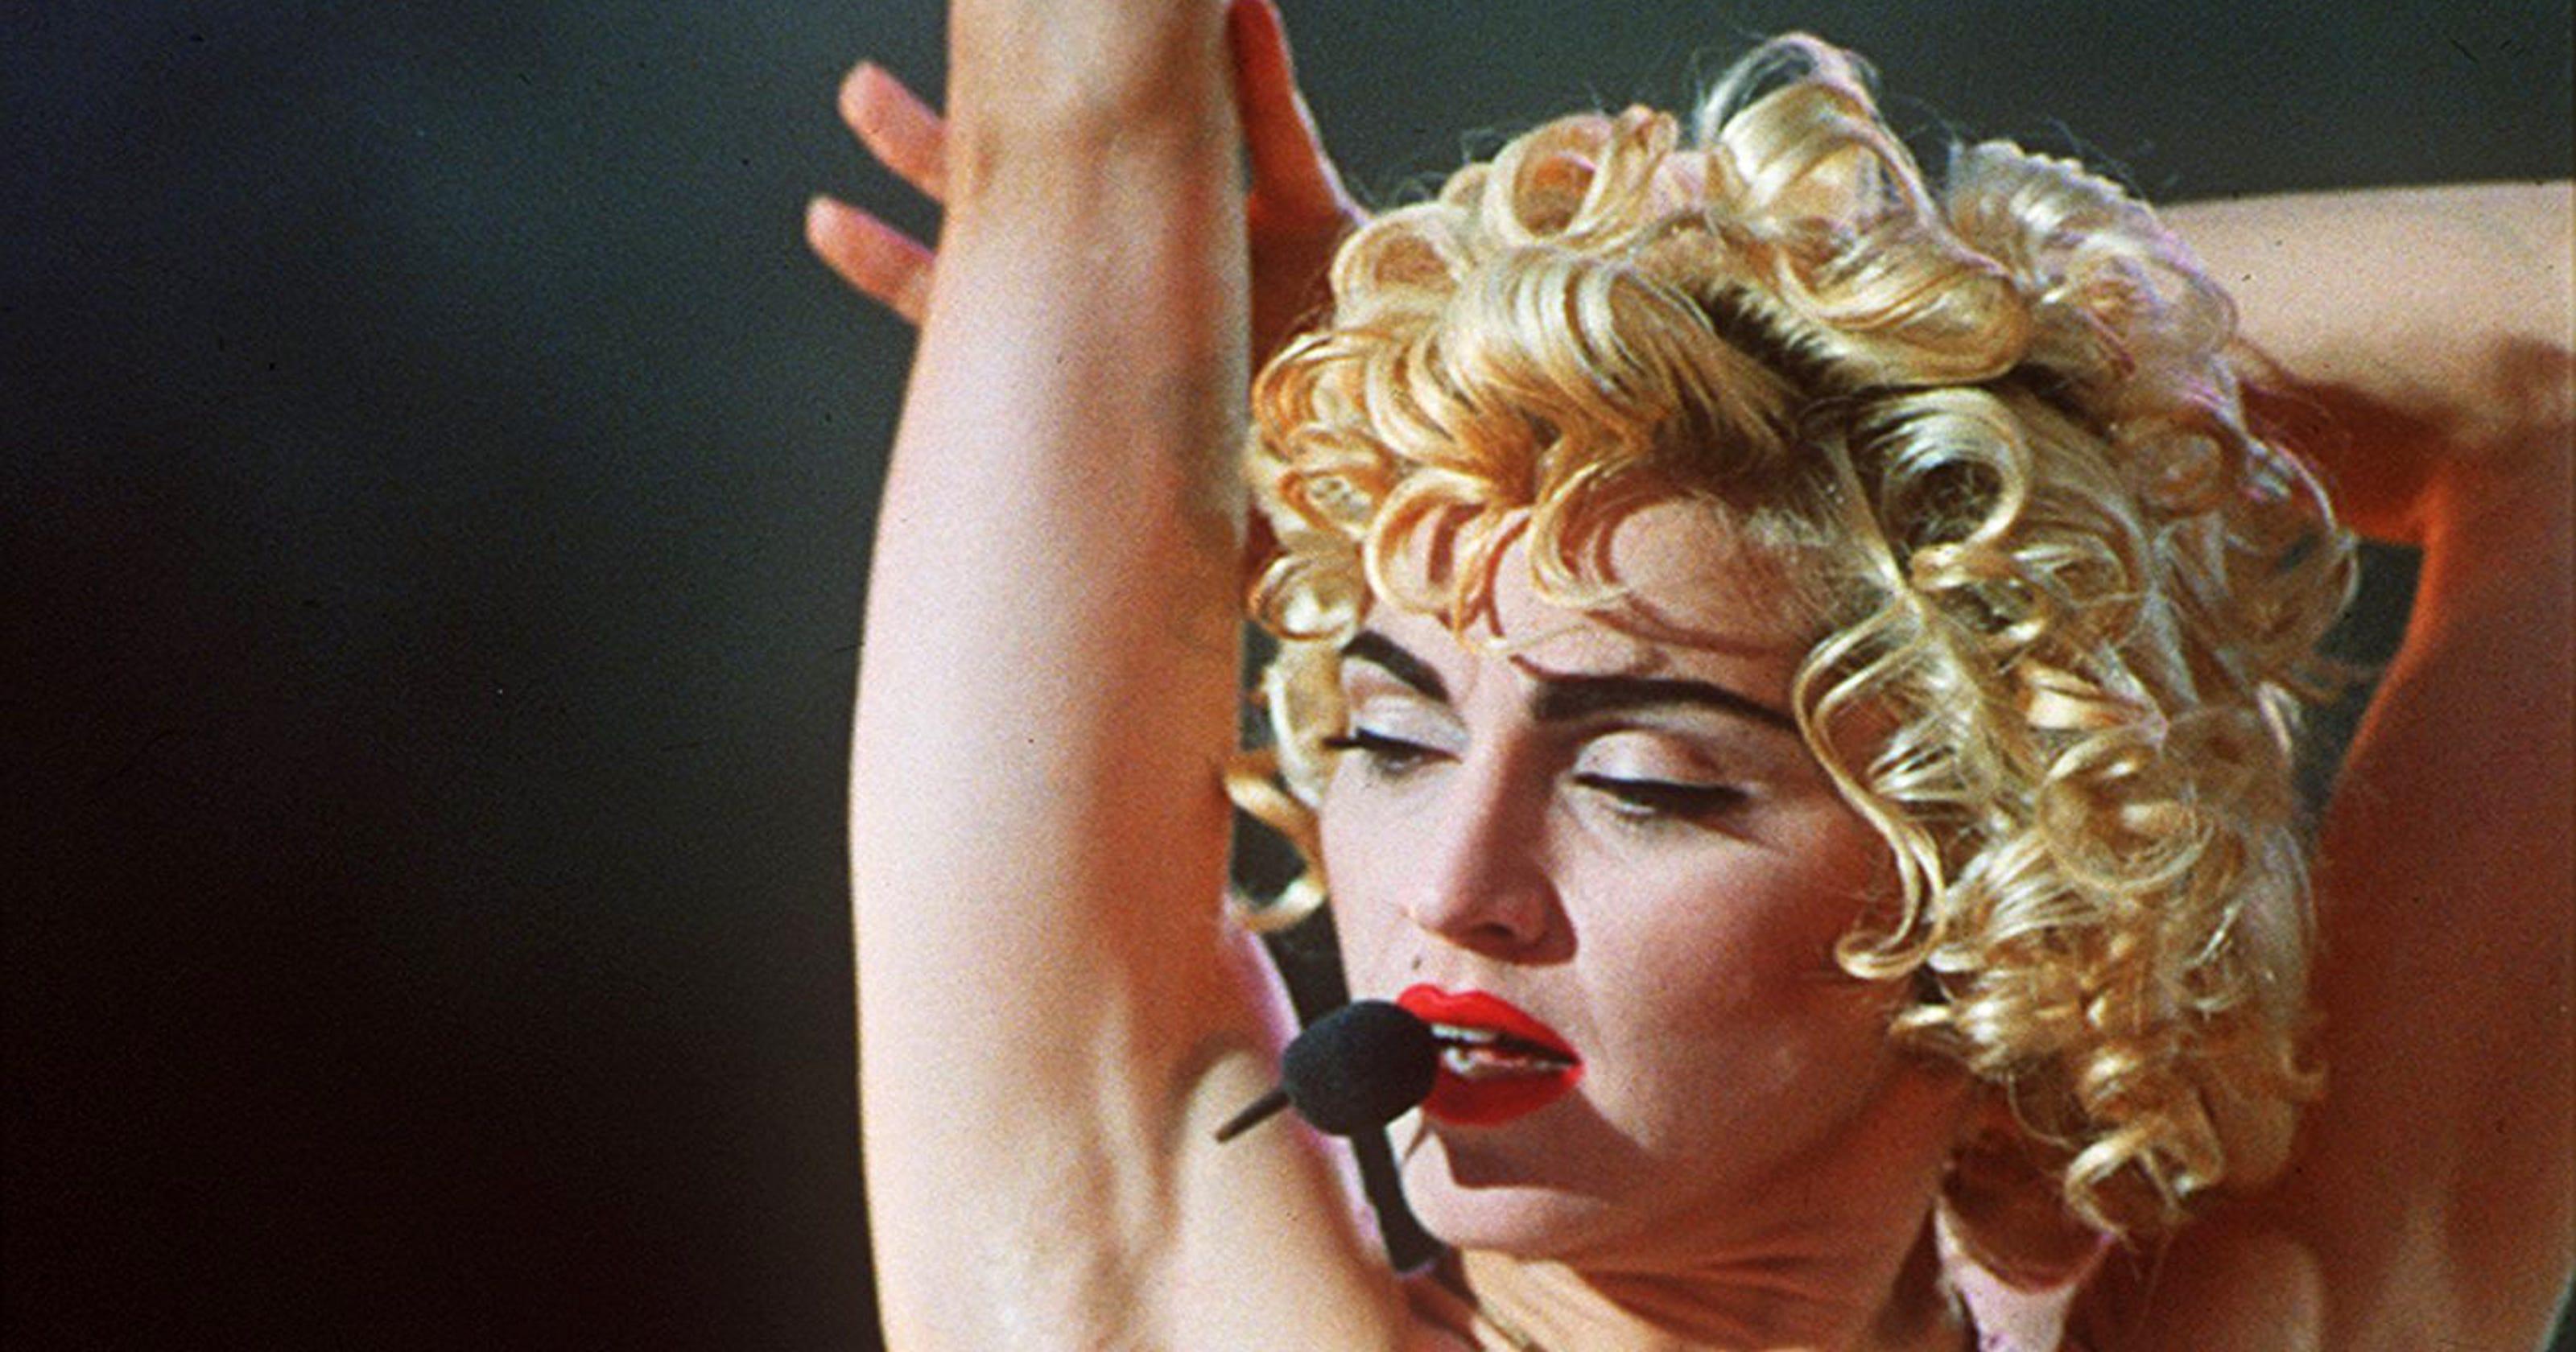 Madonna Virgin Tour Full